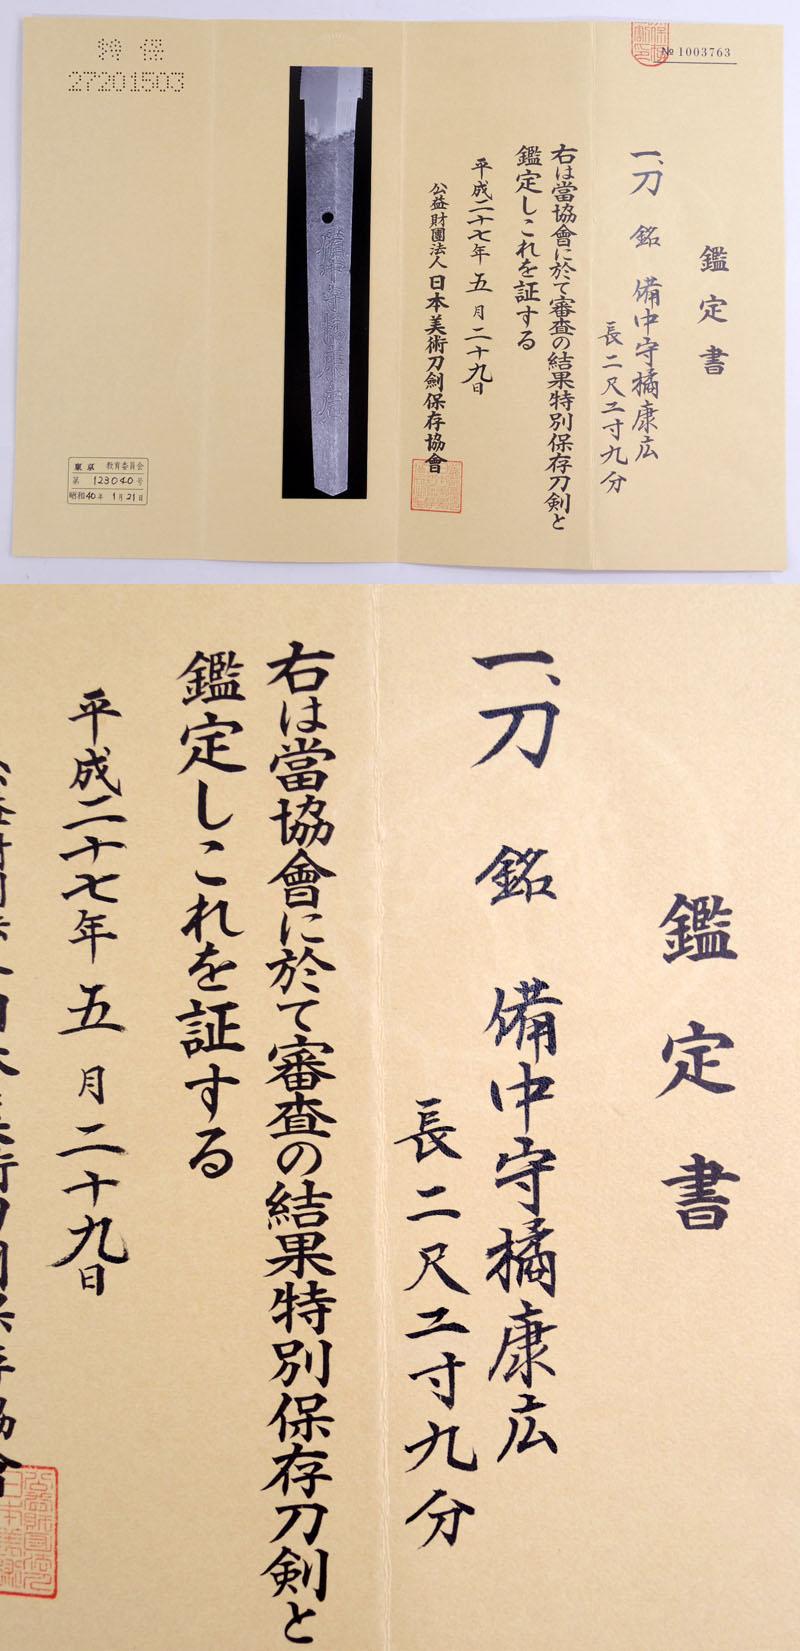 備中守橘康広(2代康広) Picture of Certificate